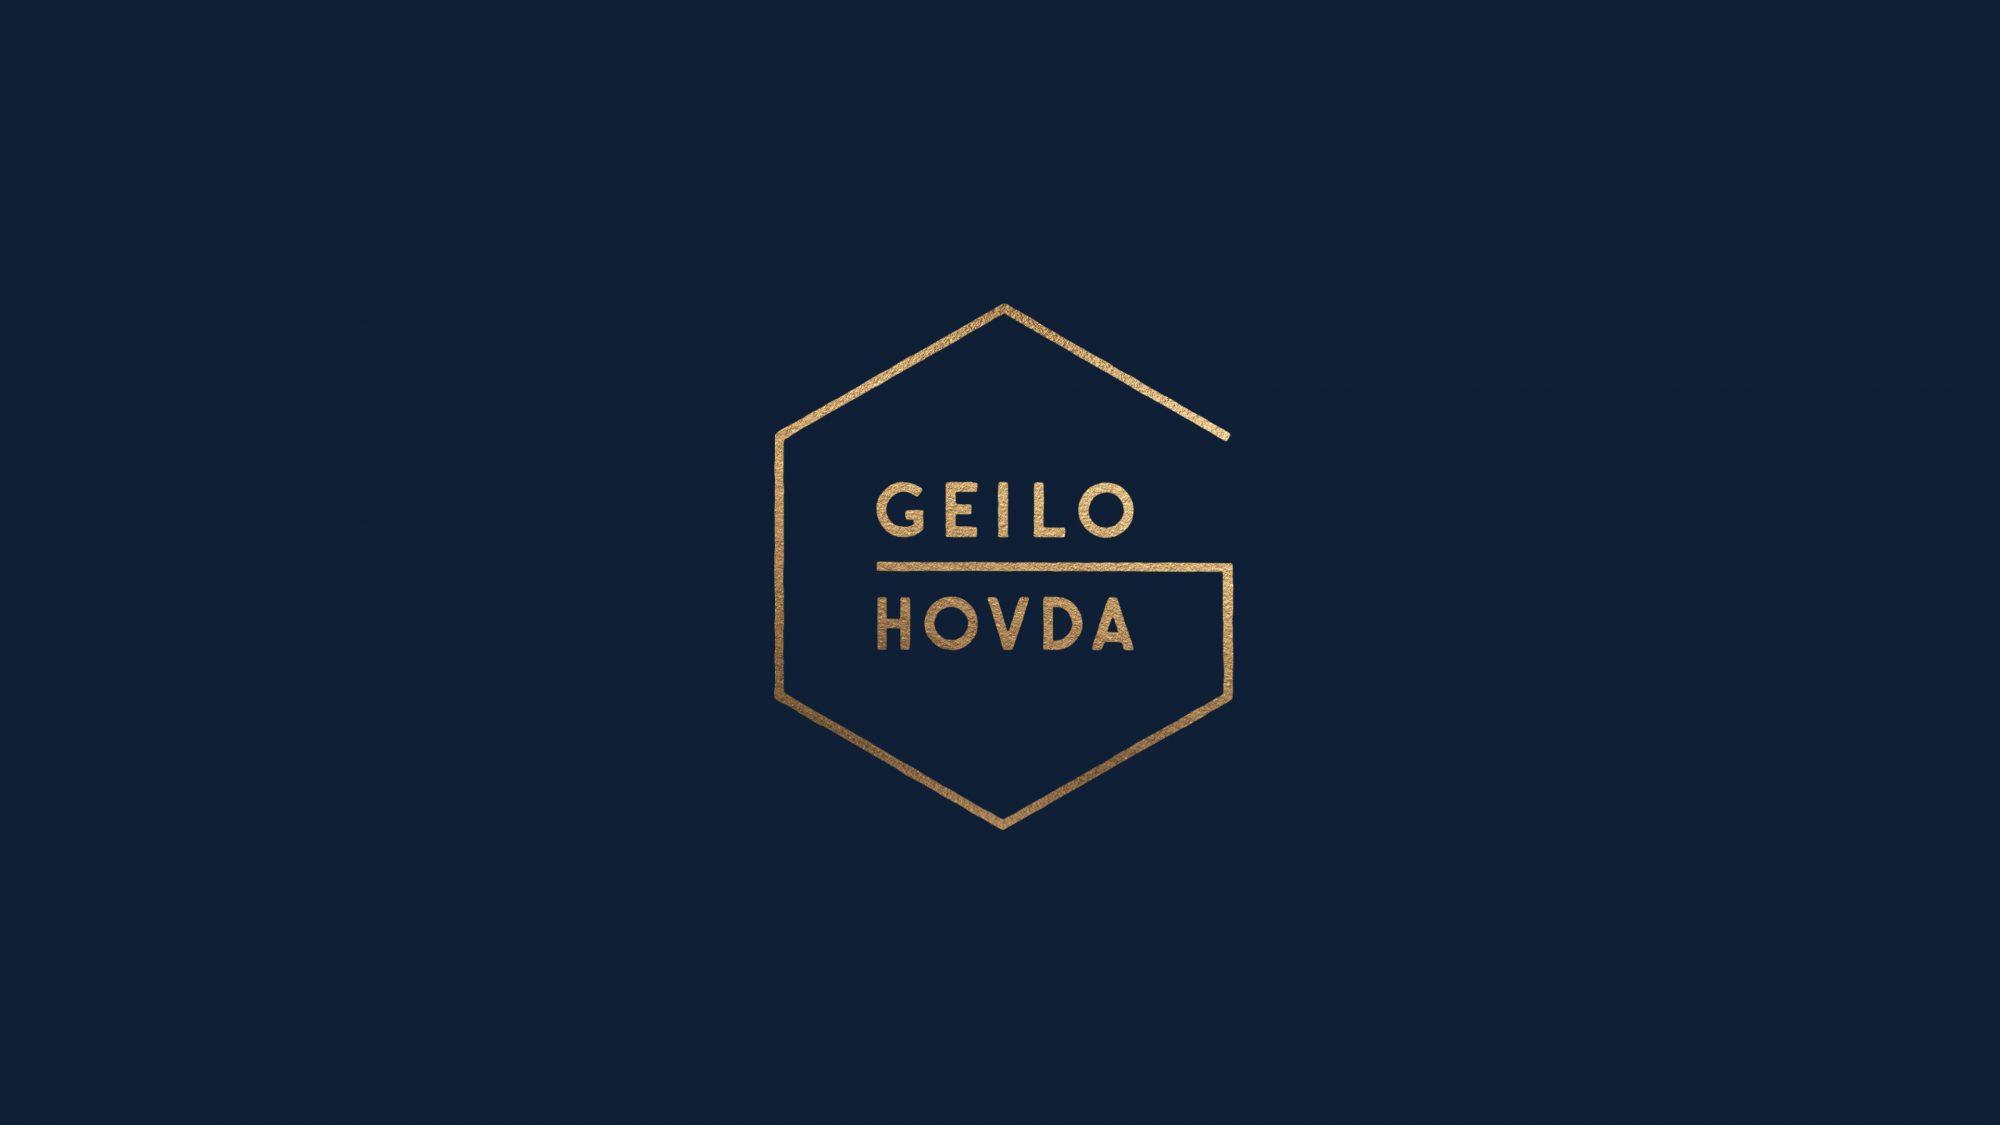 Geilohovda-3840x2640_logo